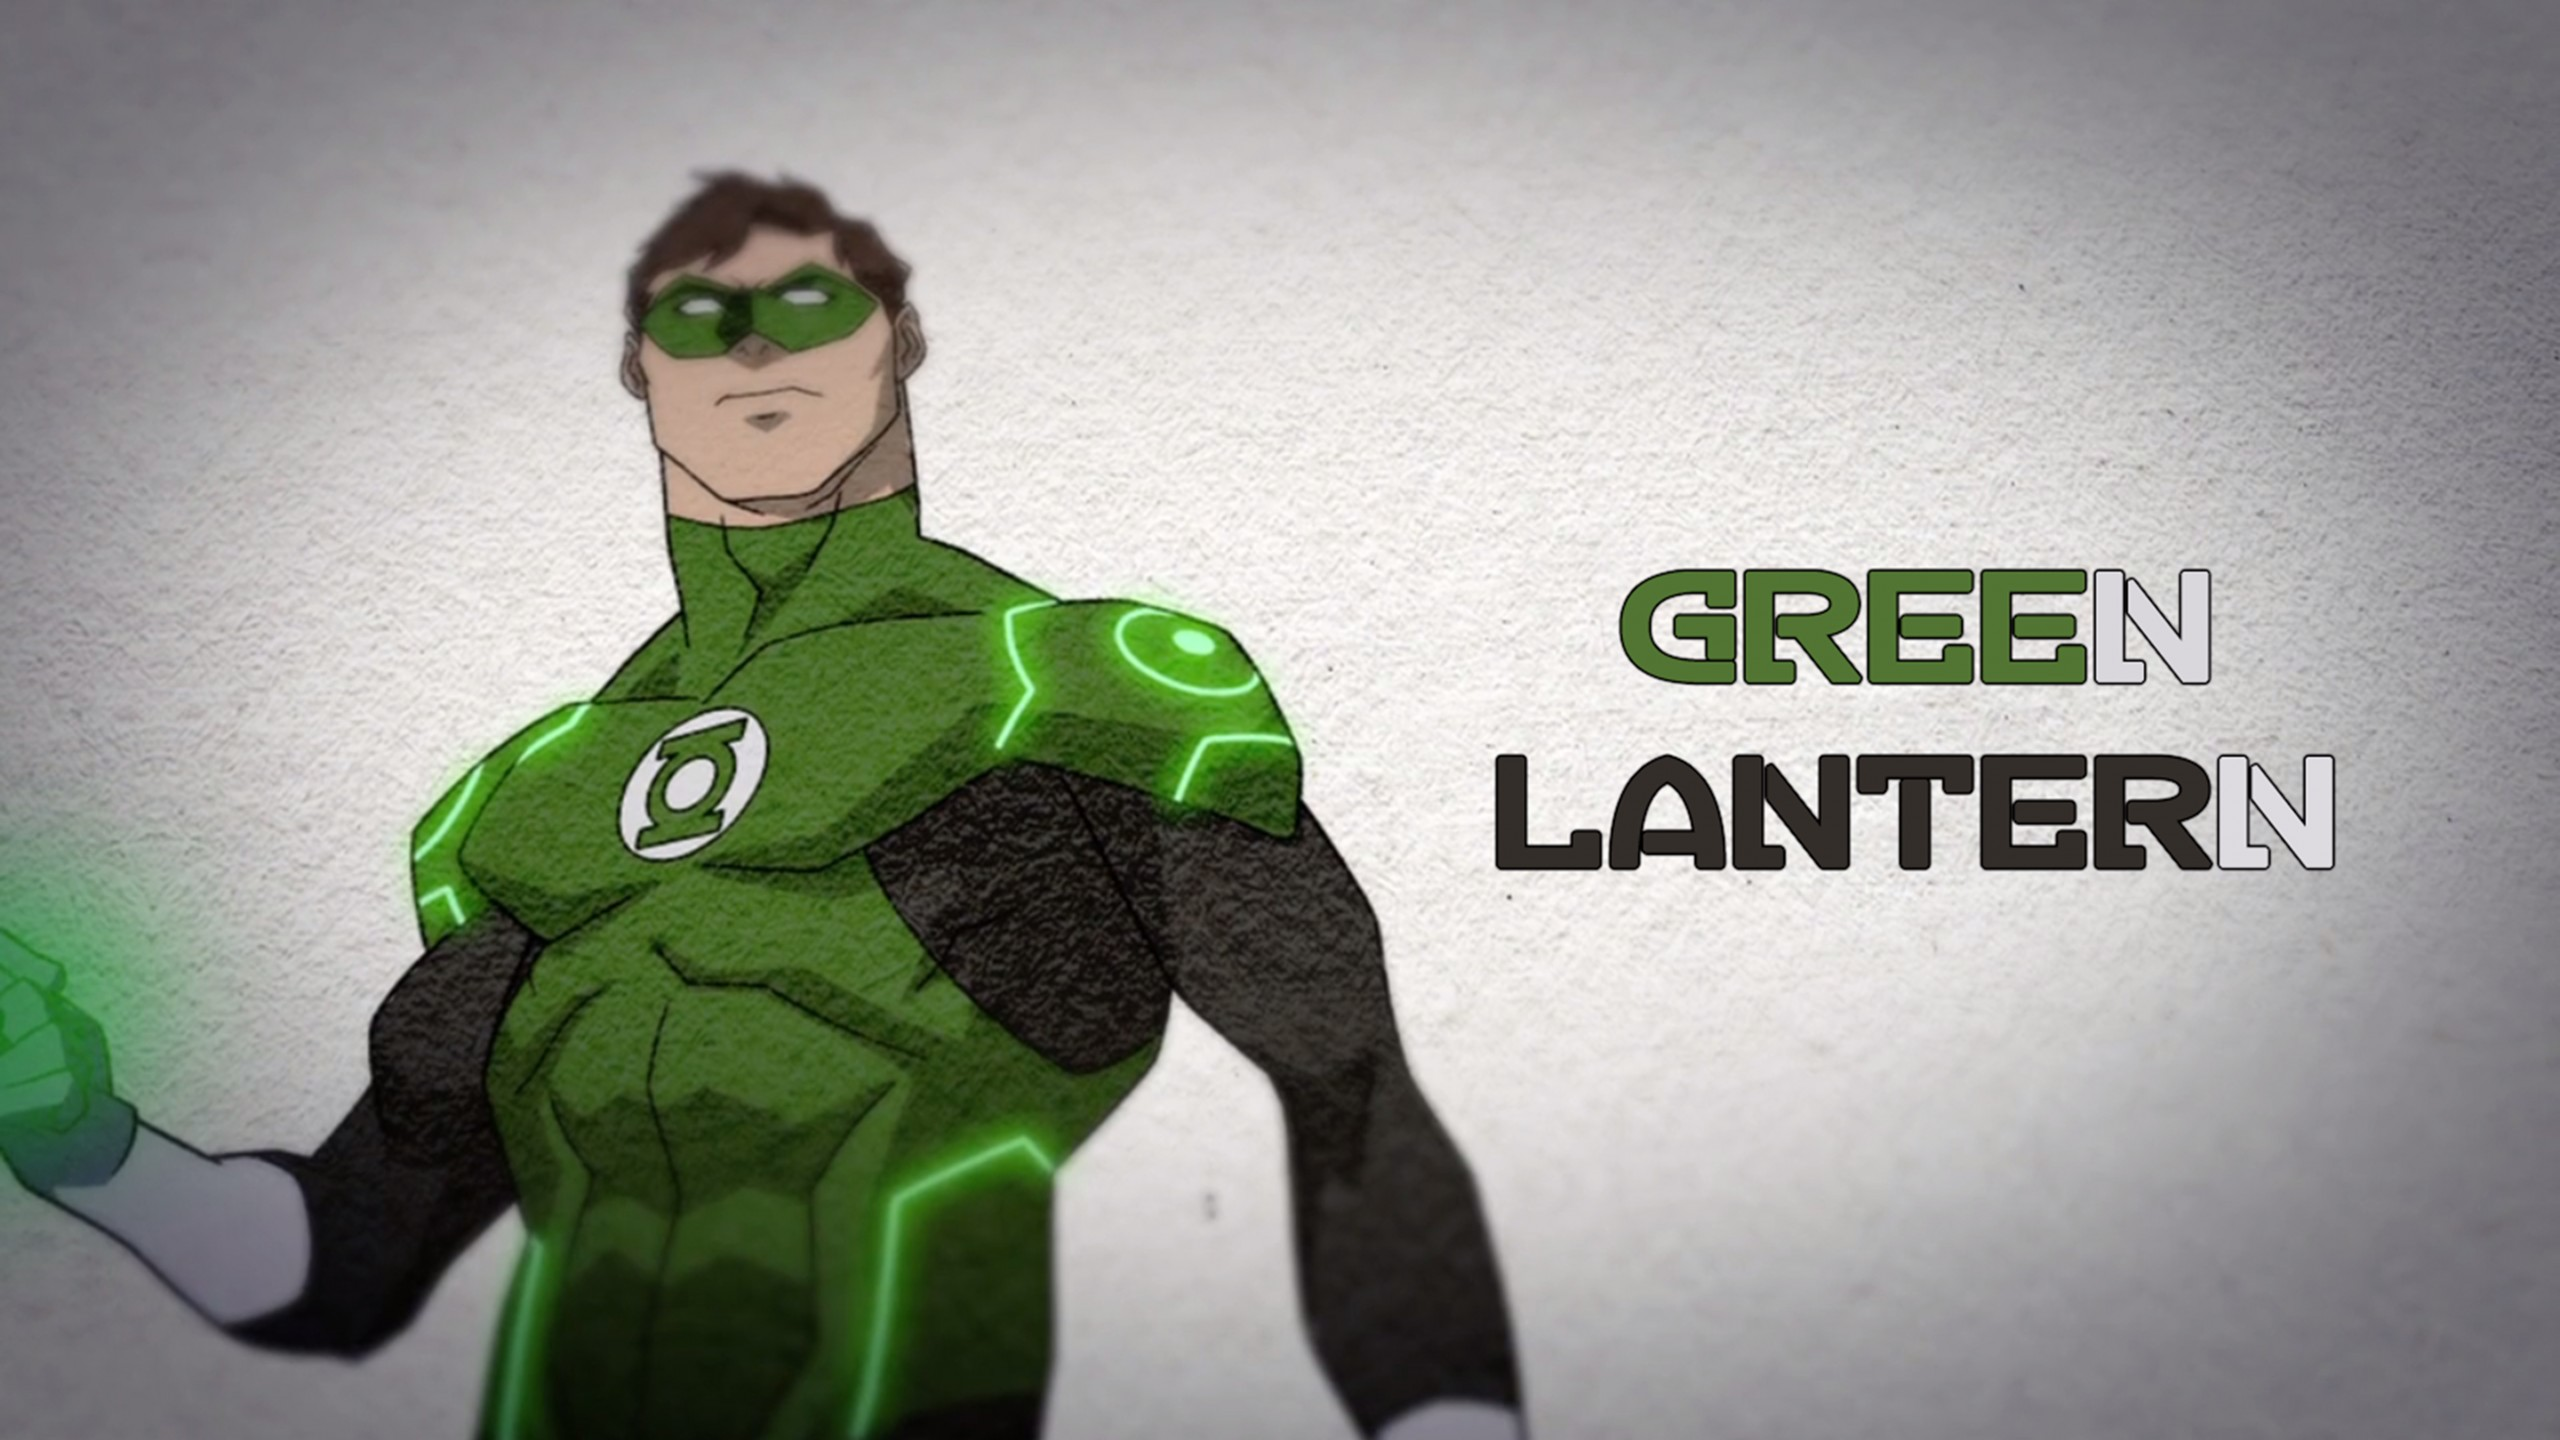 Justice League War Green Lantern 2397176 Hd Wallpaper Backgrounds Download